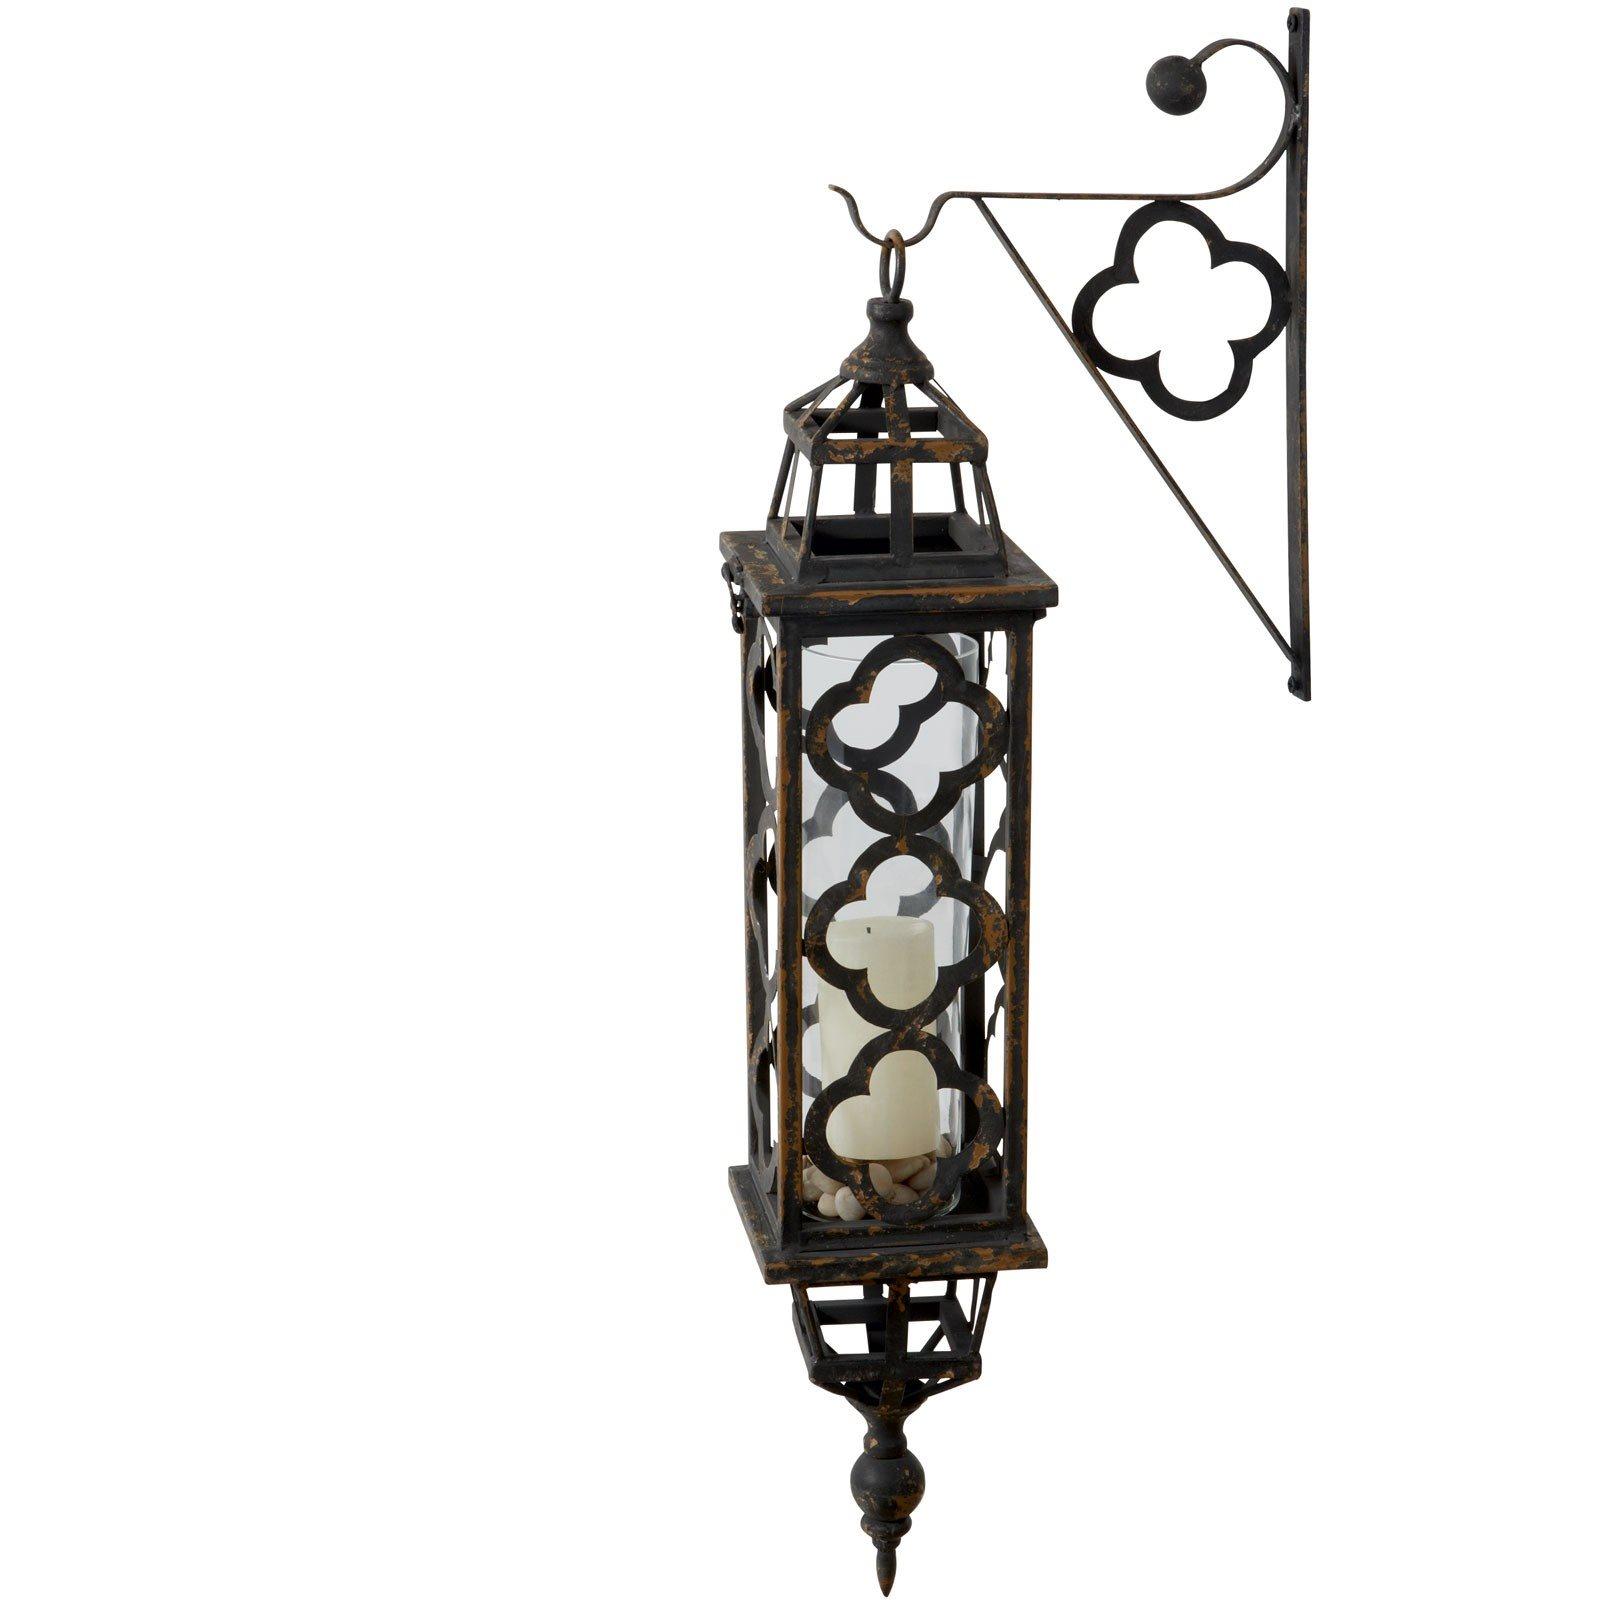 Dimond Aged Black Quatrefoil Lantern Lzs